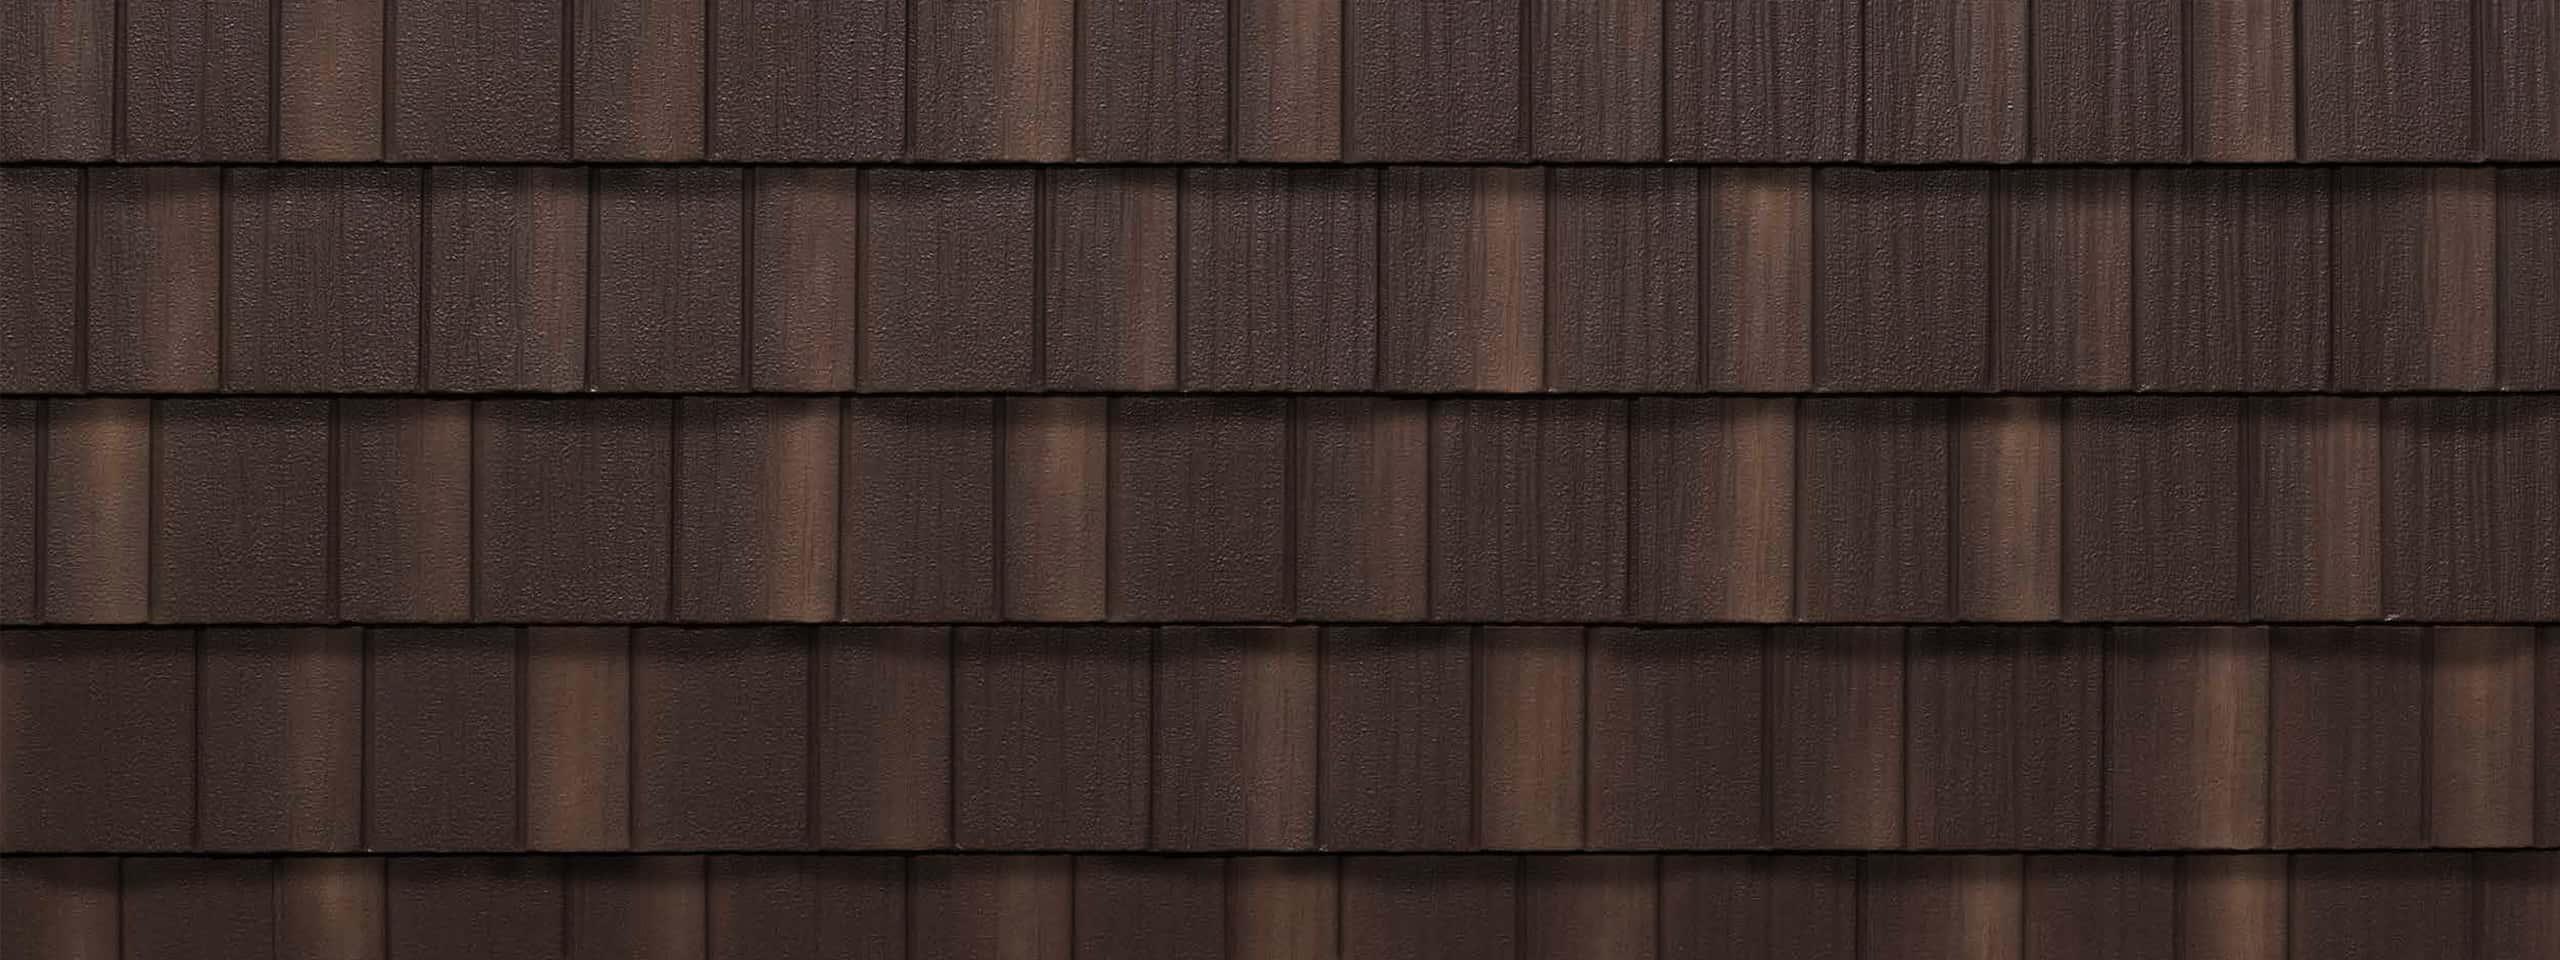 EDCO Infiniti® Textured Steel Shake Chestnut Brown Enhanced Swatch